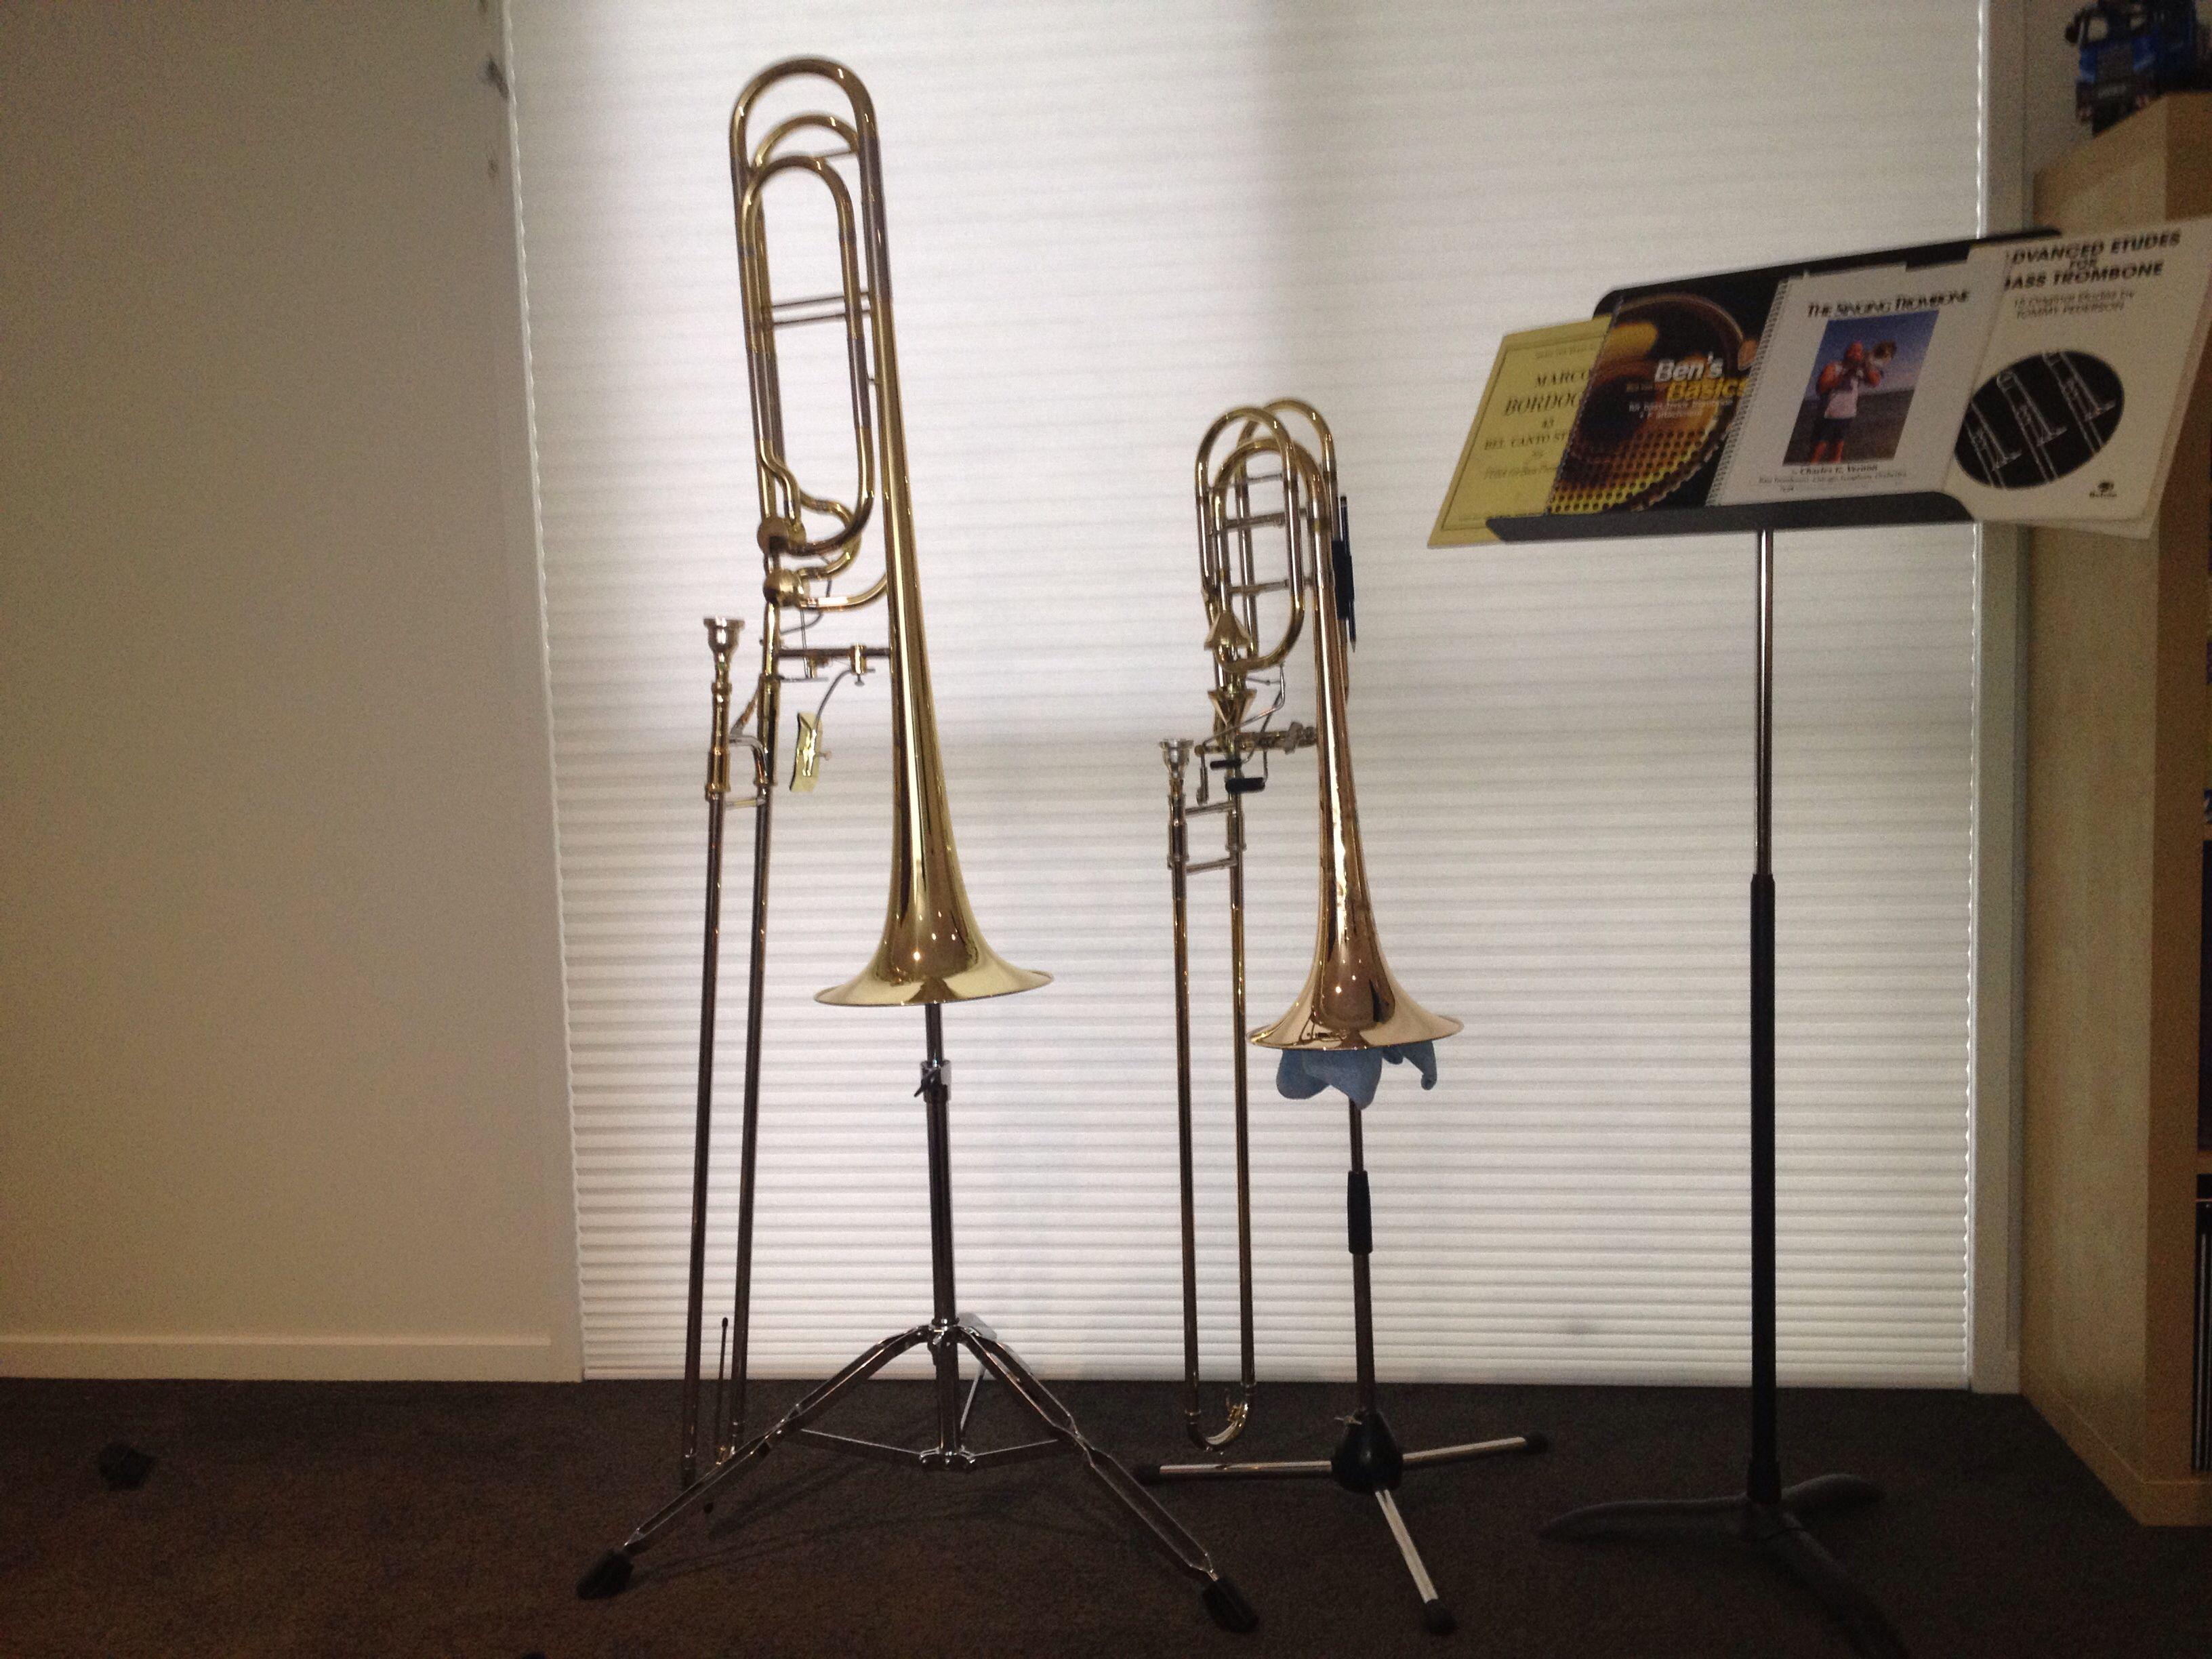 SE Shires bass trombone with Kanstul Contra Bass Trombone